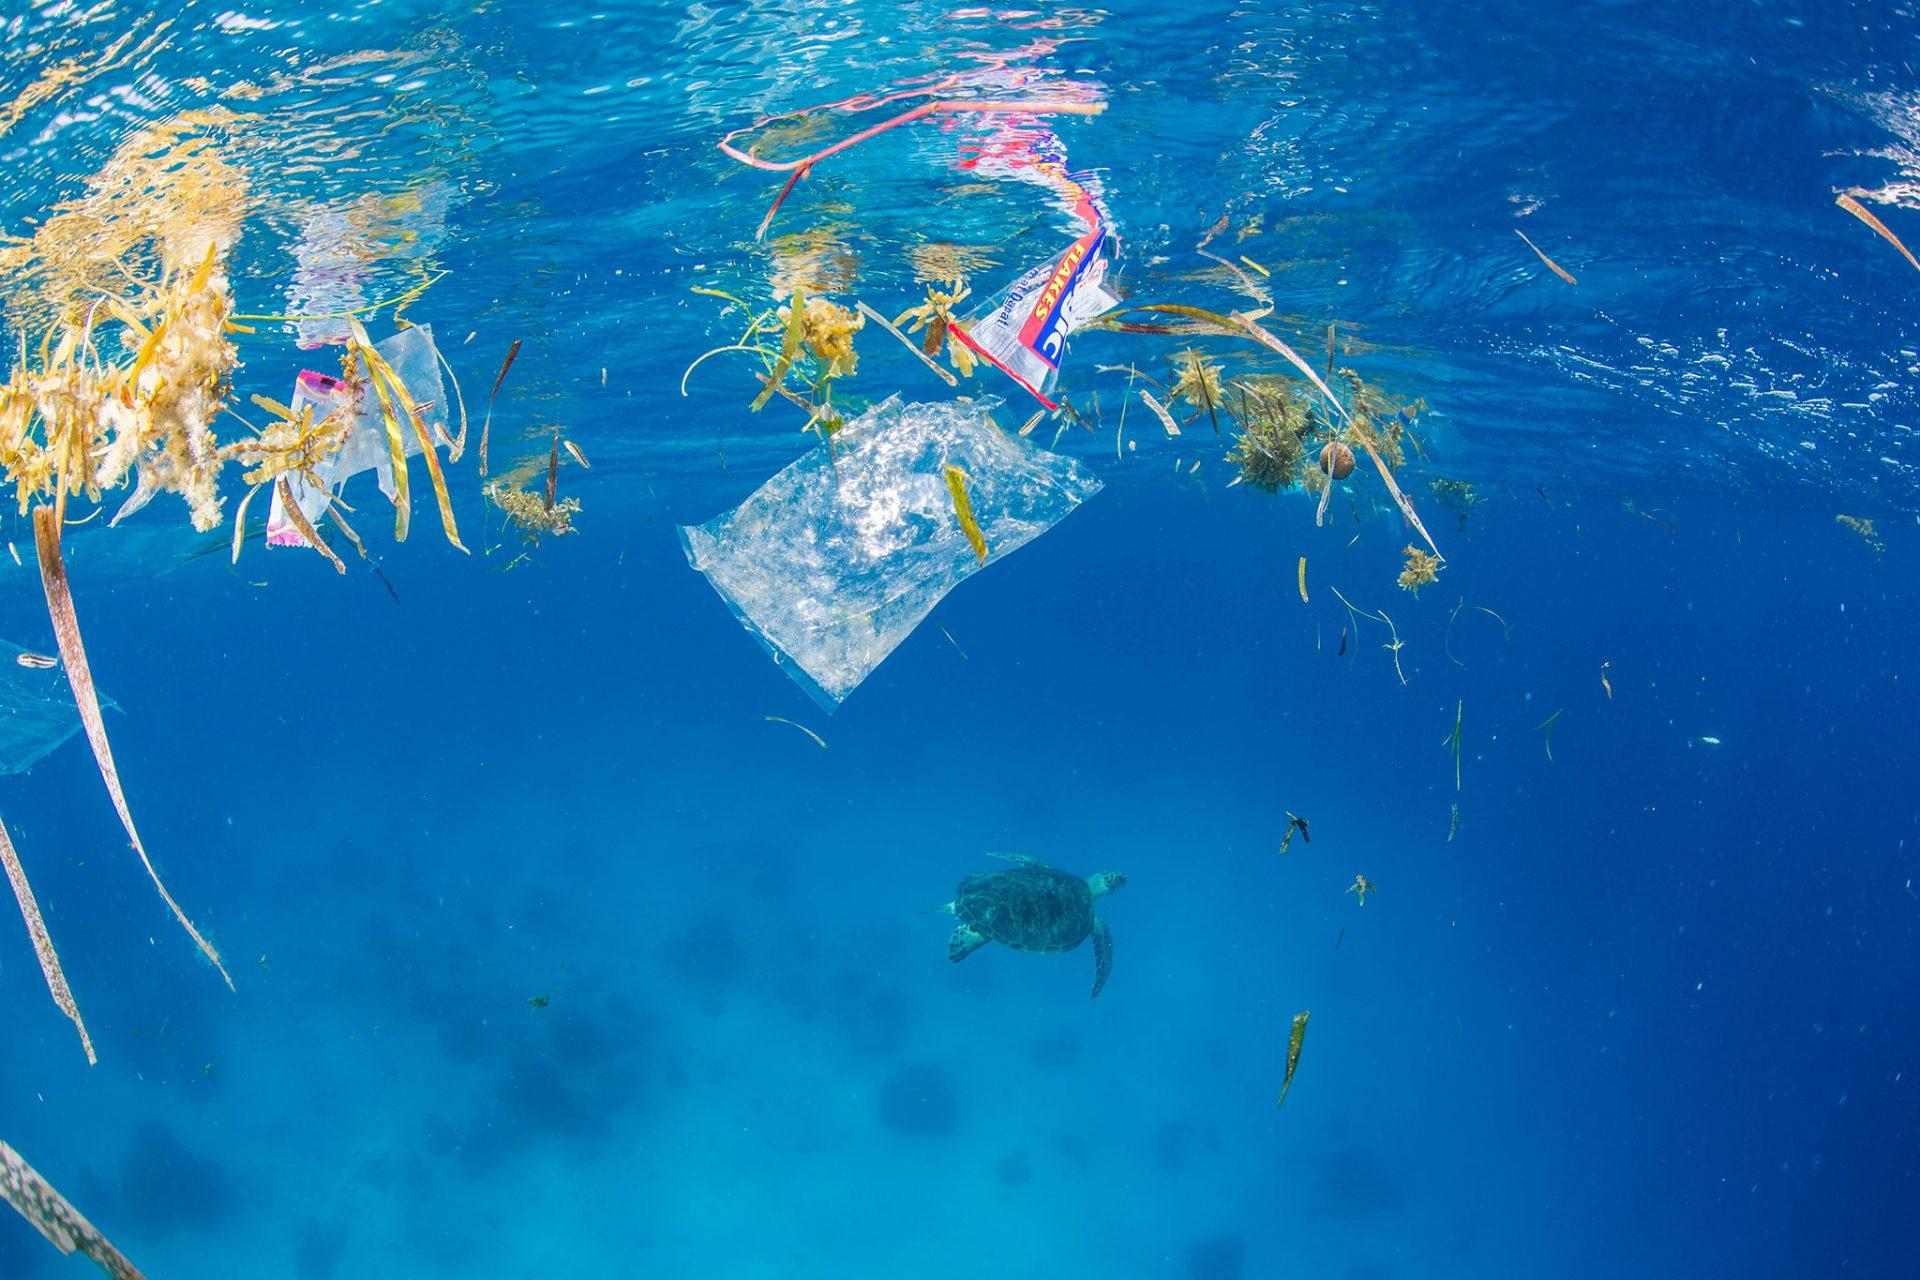 robô para limpeza oceânica